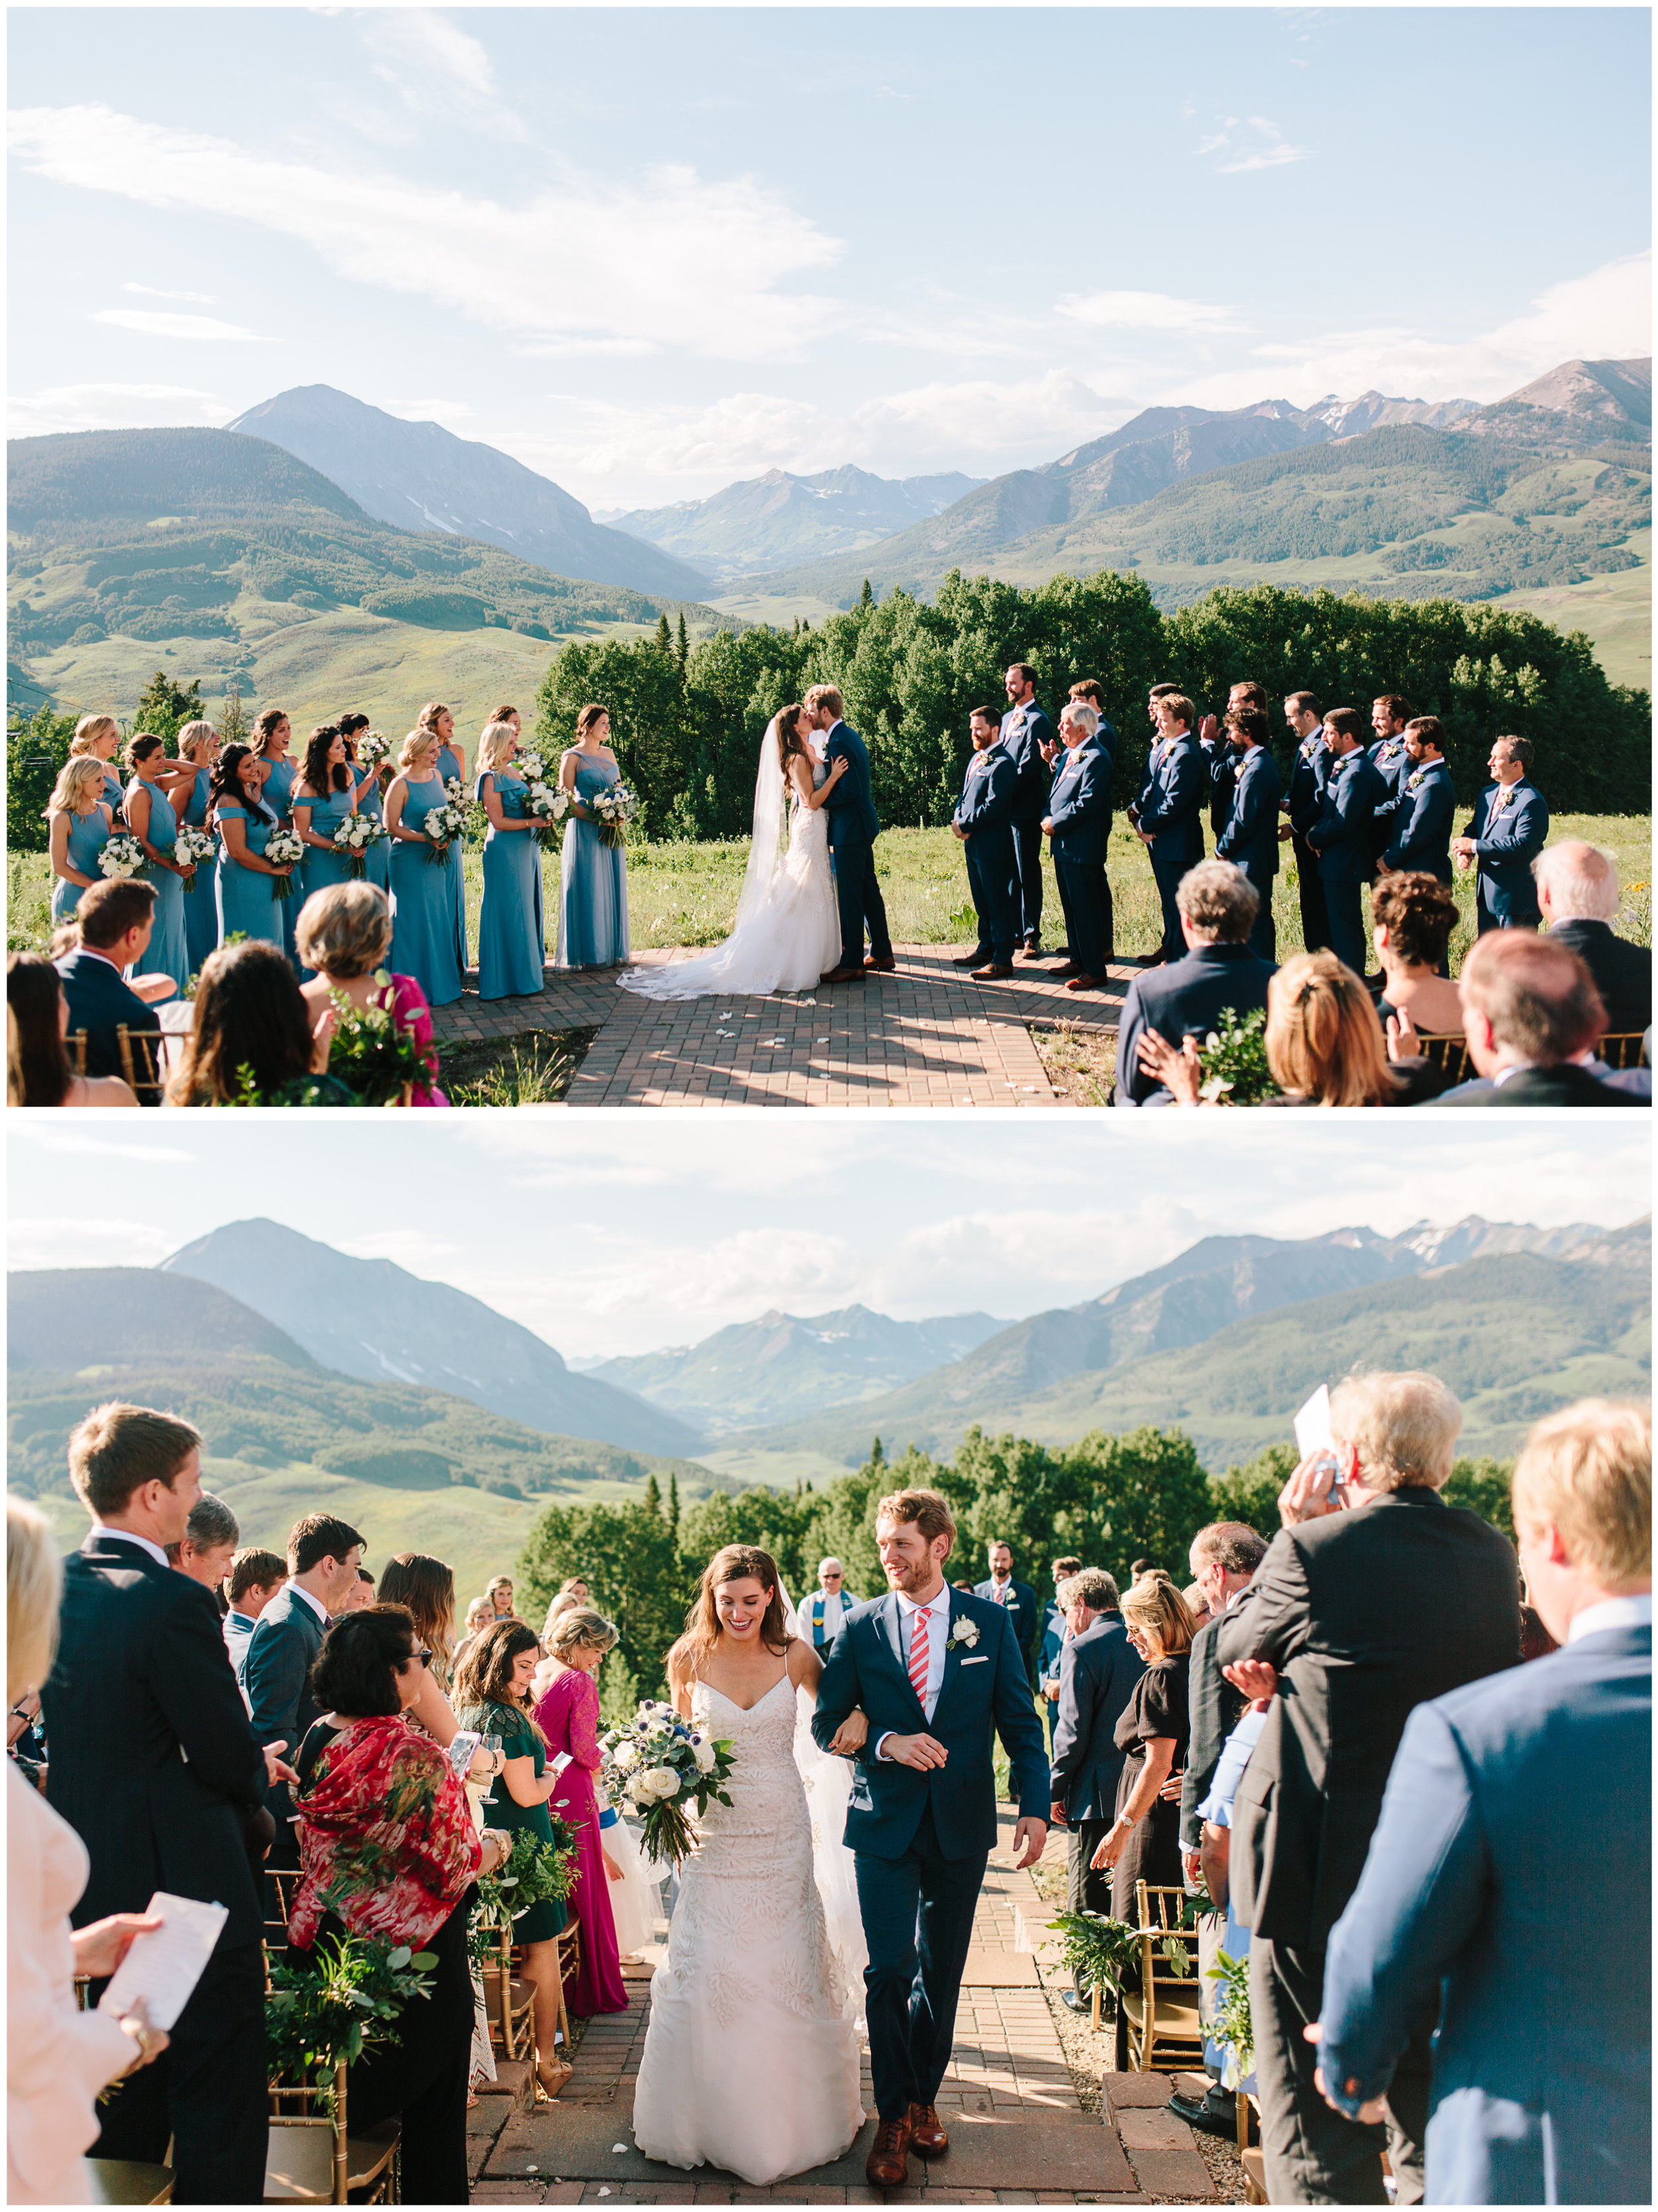 crested_butte_wedding_91.jpg